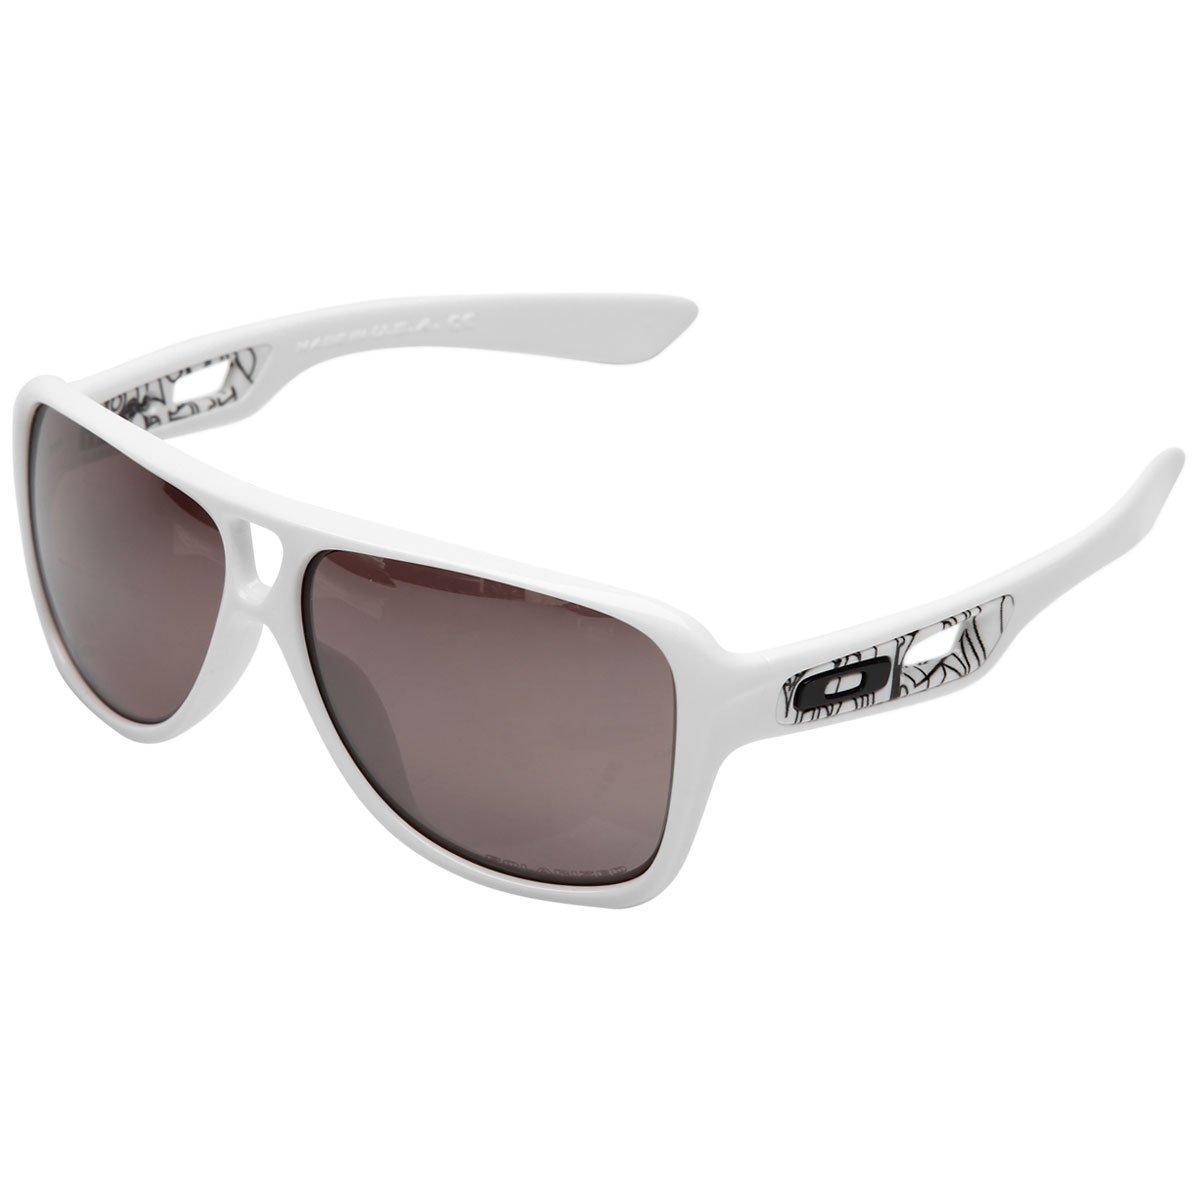 4c634de669bbf Óculos de Sol Oakley Dispatch 2 Iridium - Compre Agora